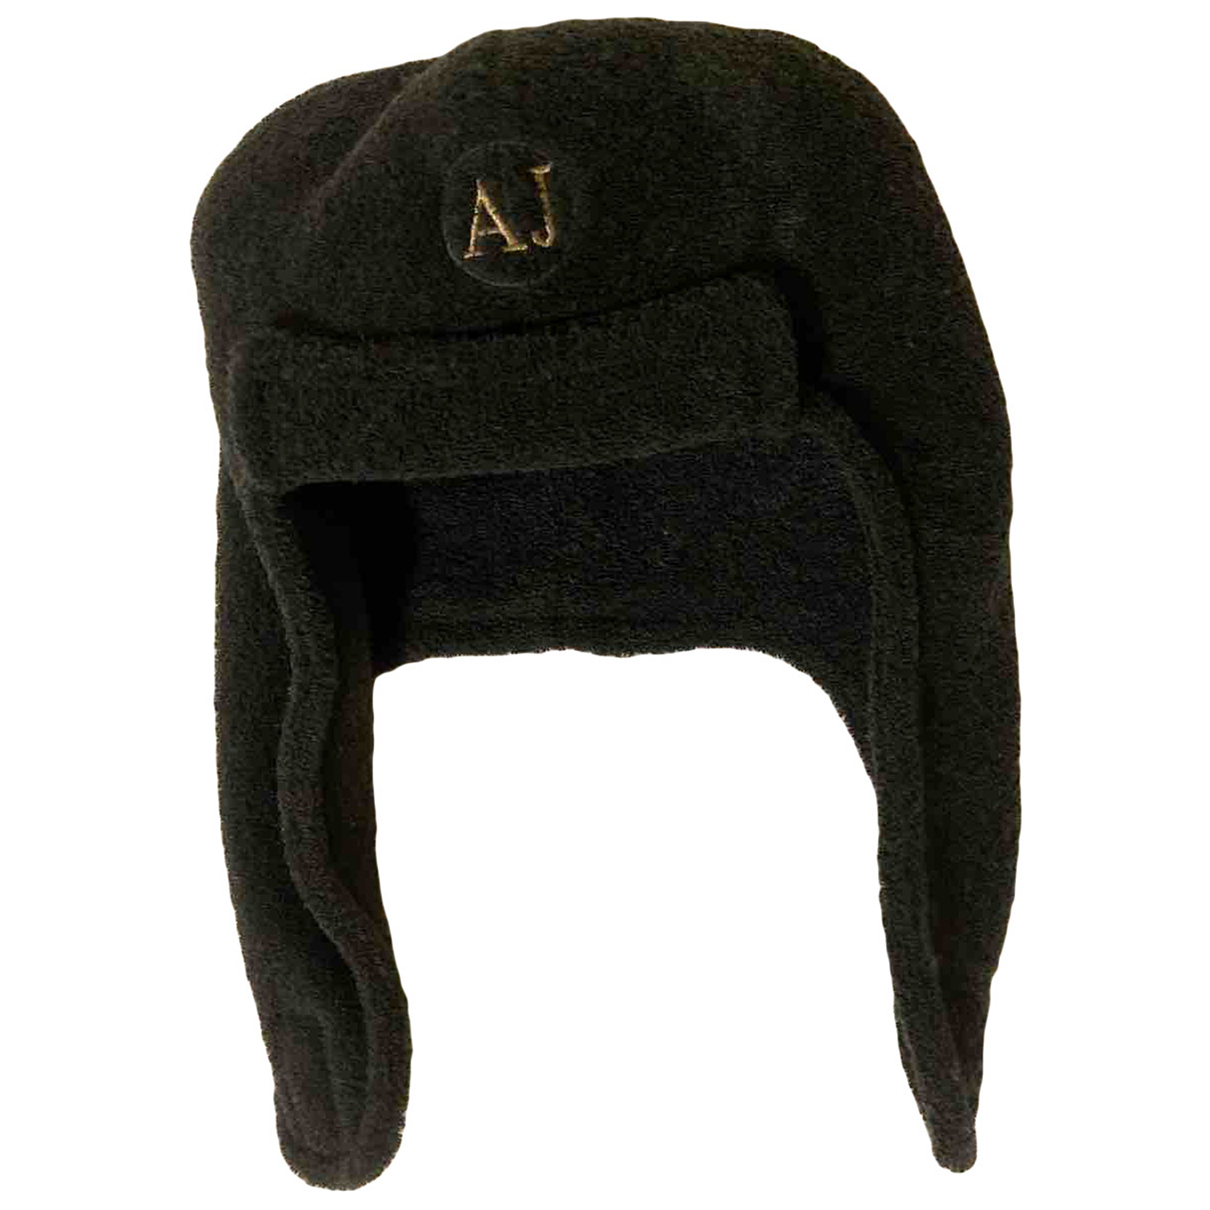 Armani Jeans N Grey hat & pull on hat for Men L International